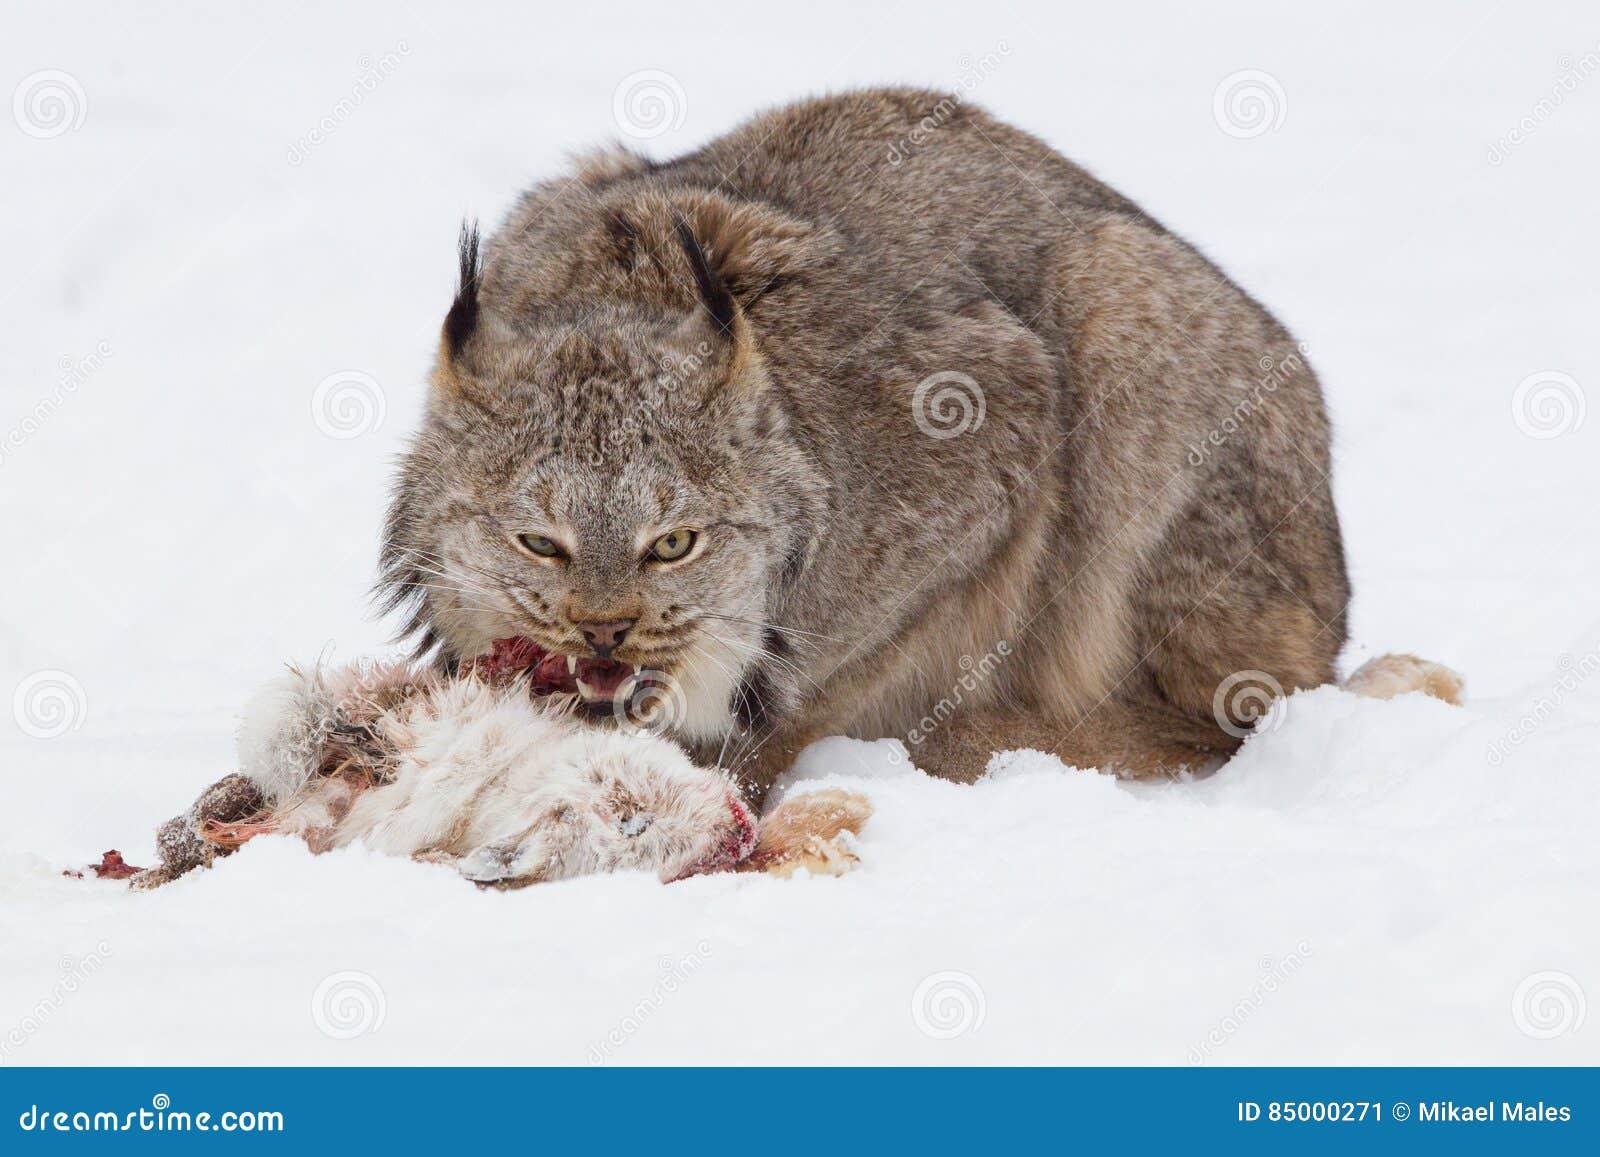 lynx-eating-rabbit-snowshoe-hare-8500027